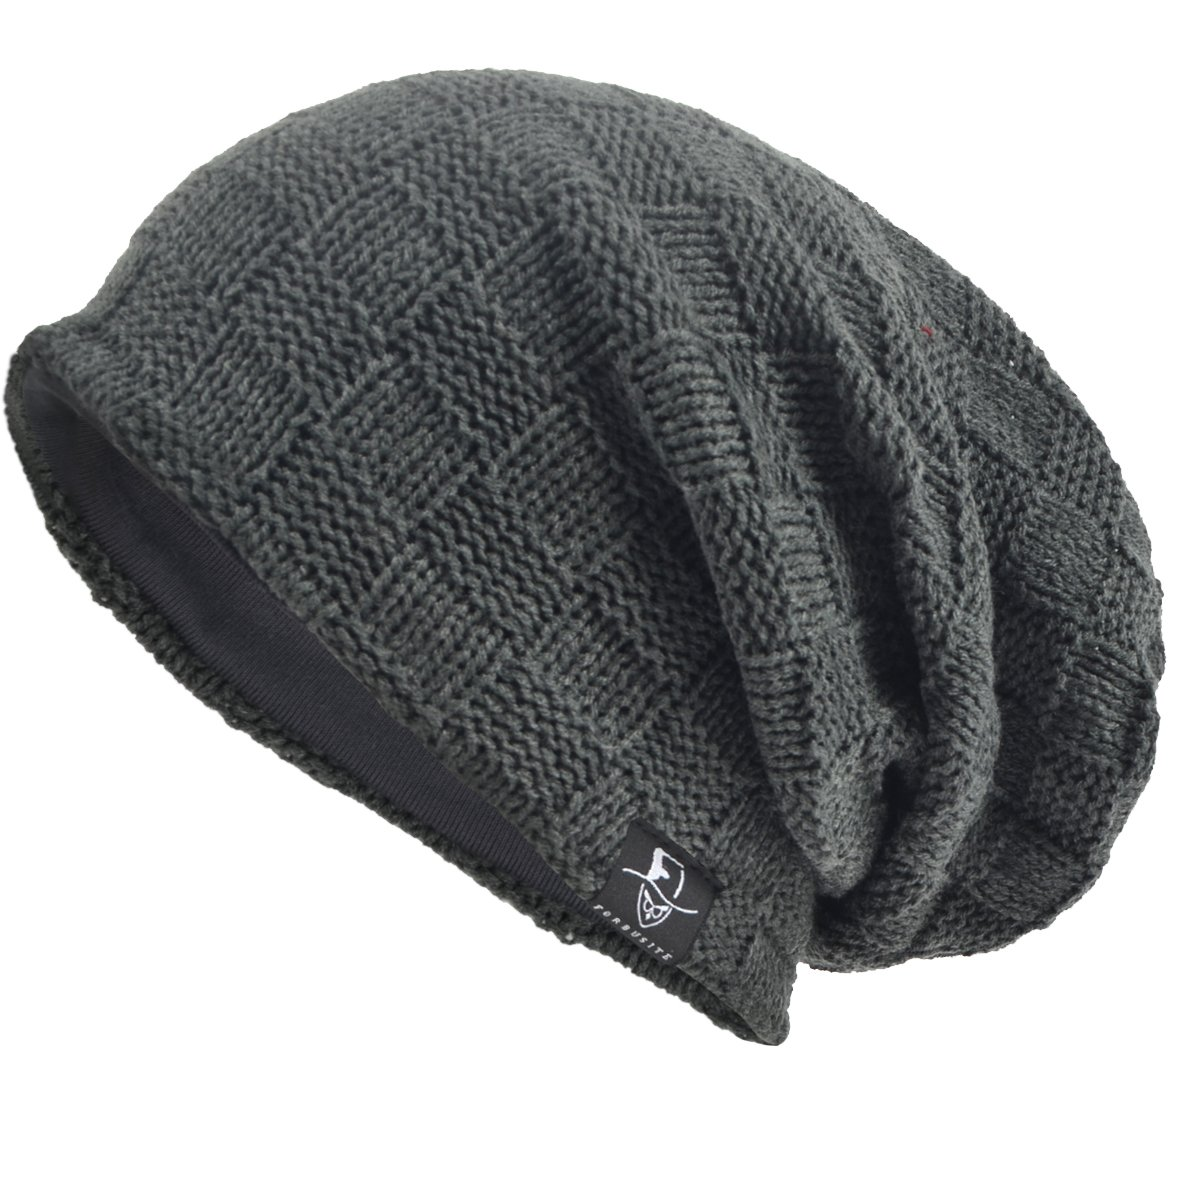 JESSE · RENA Men Beanie Hat Knit Slouchy Baggy Skull Cap CFB306 CF-B306-Blue